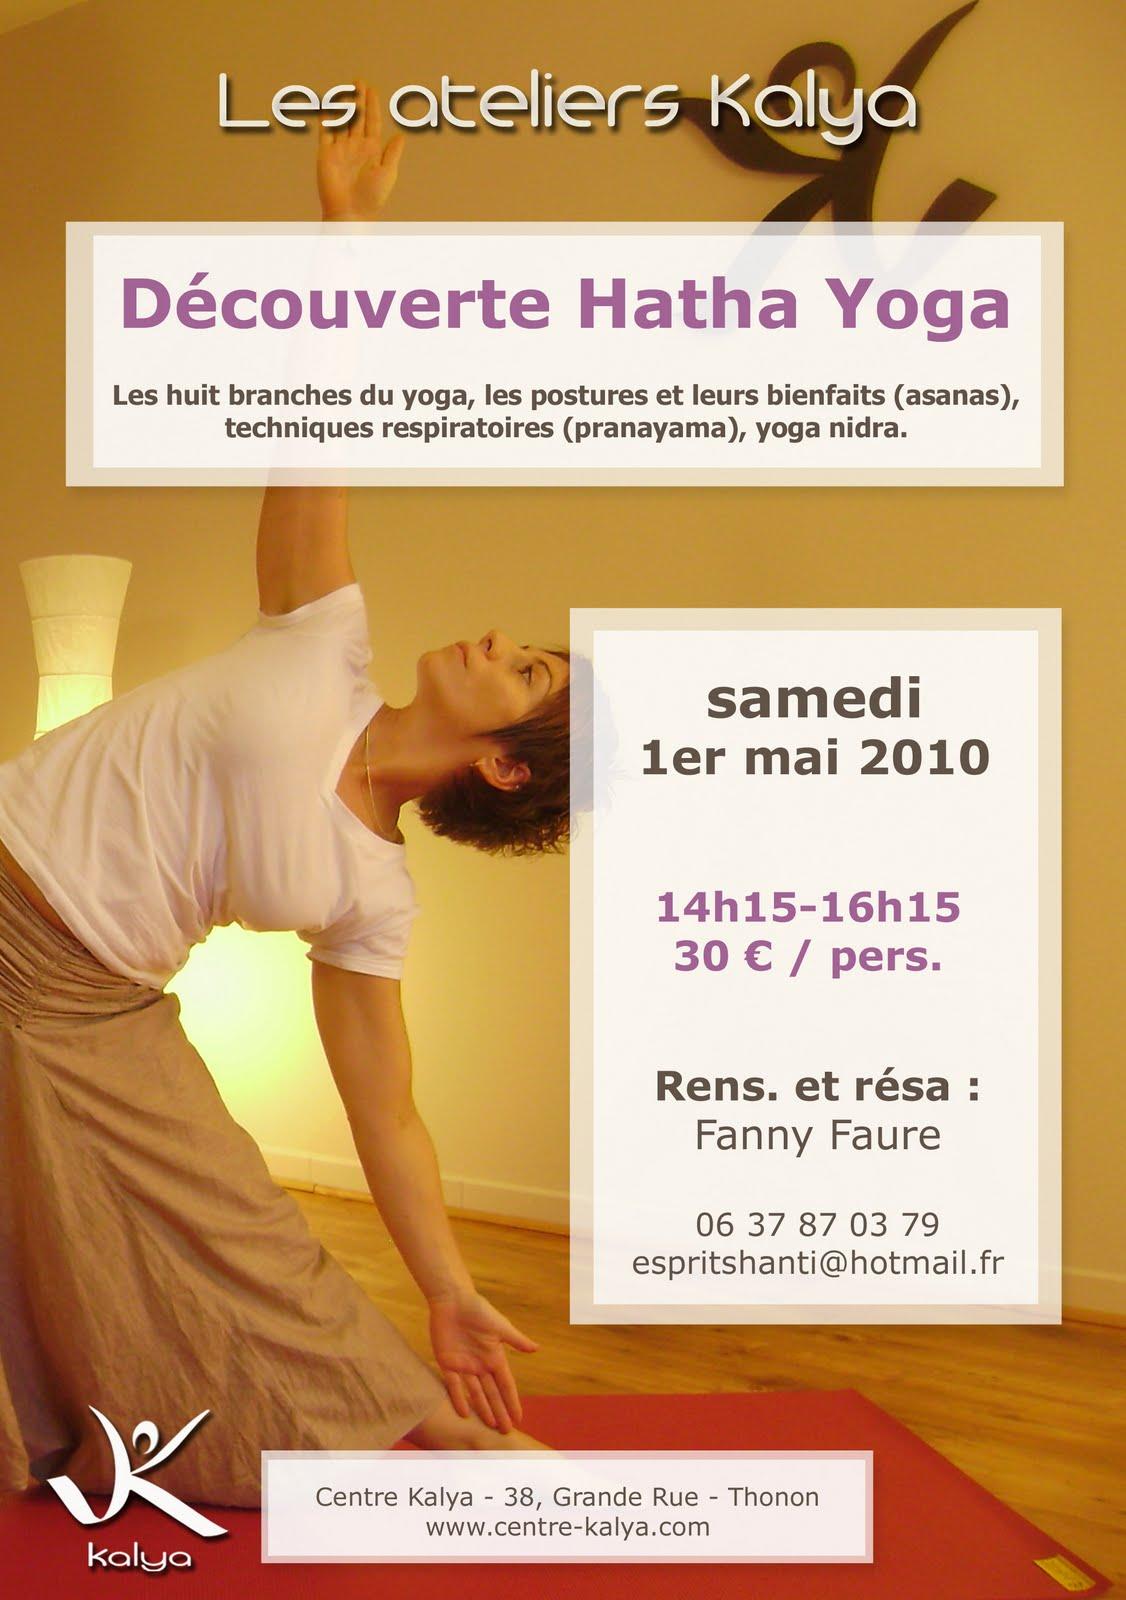 arts of yoga le blog de julien levy atelier d couverte du hatha yoga centre kalya. Black Bedroom Furniture Sets. Home Design Ideas